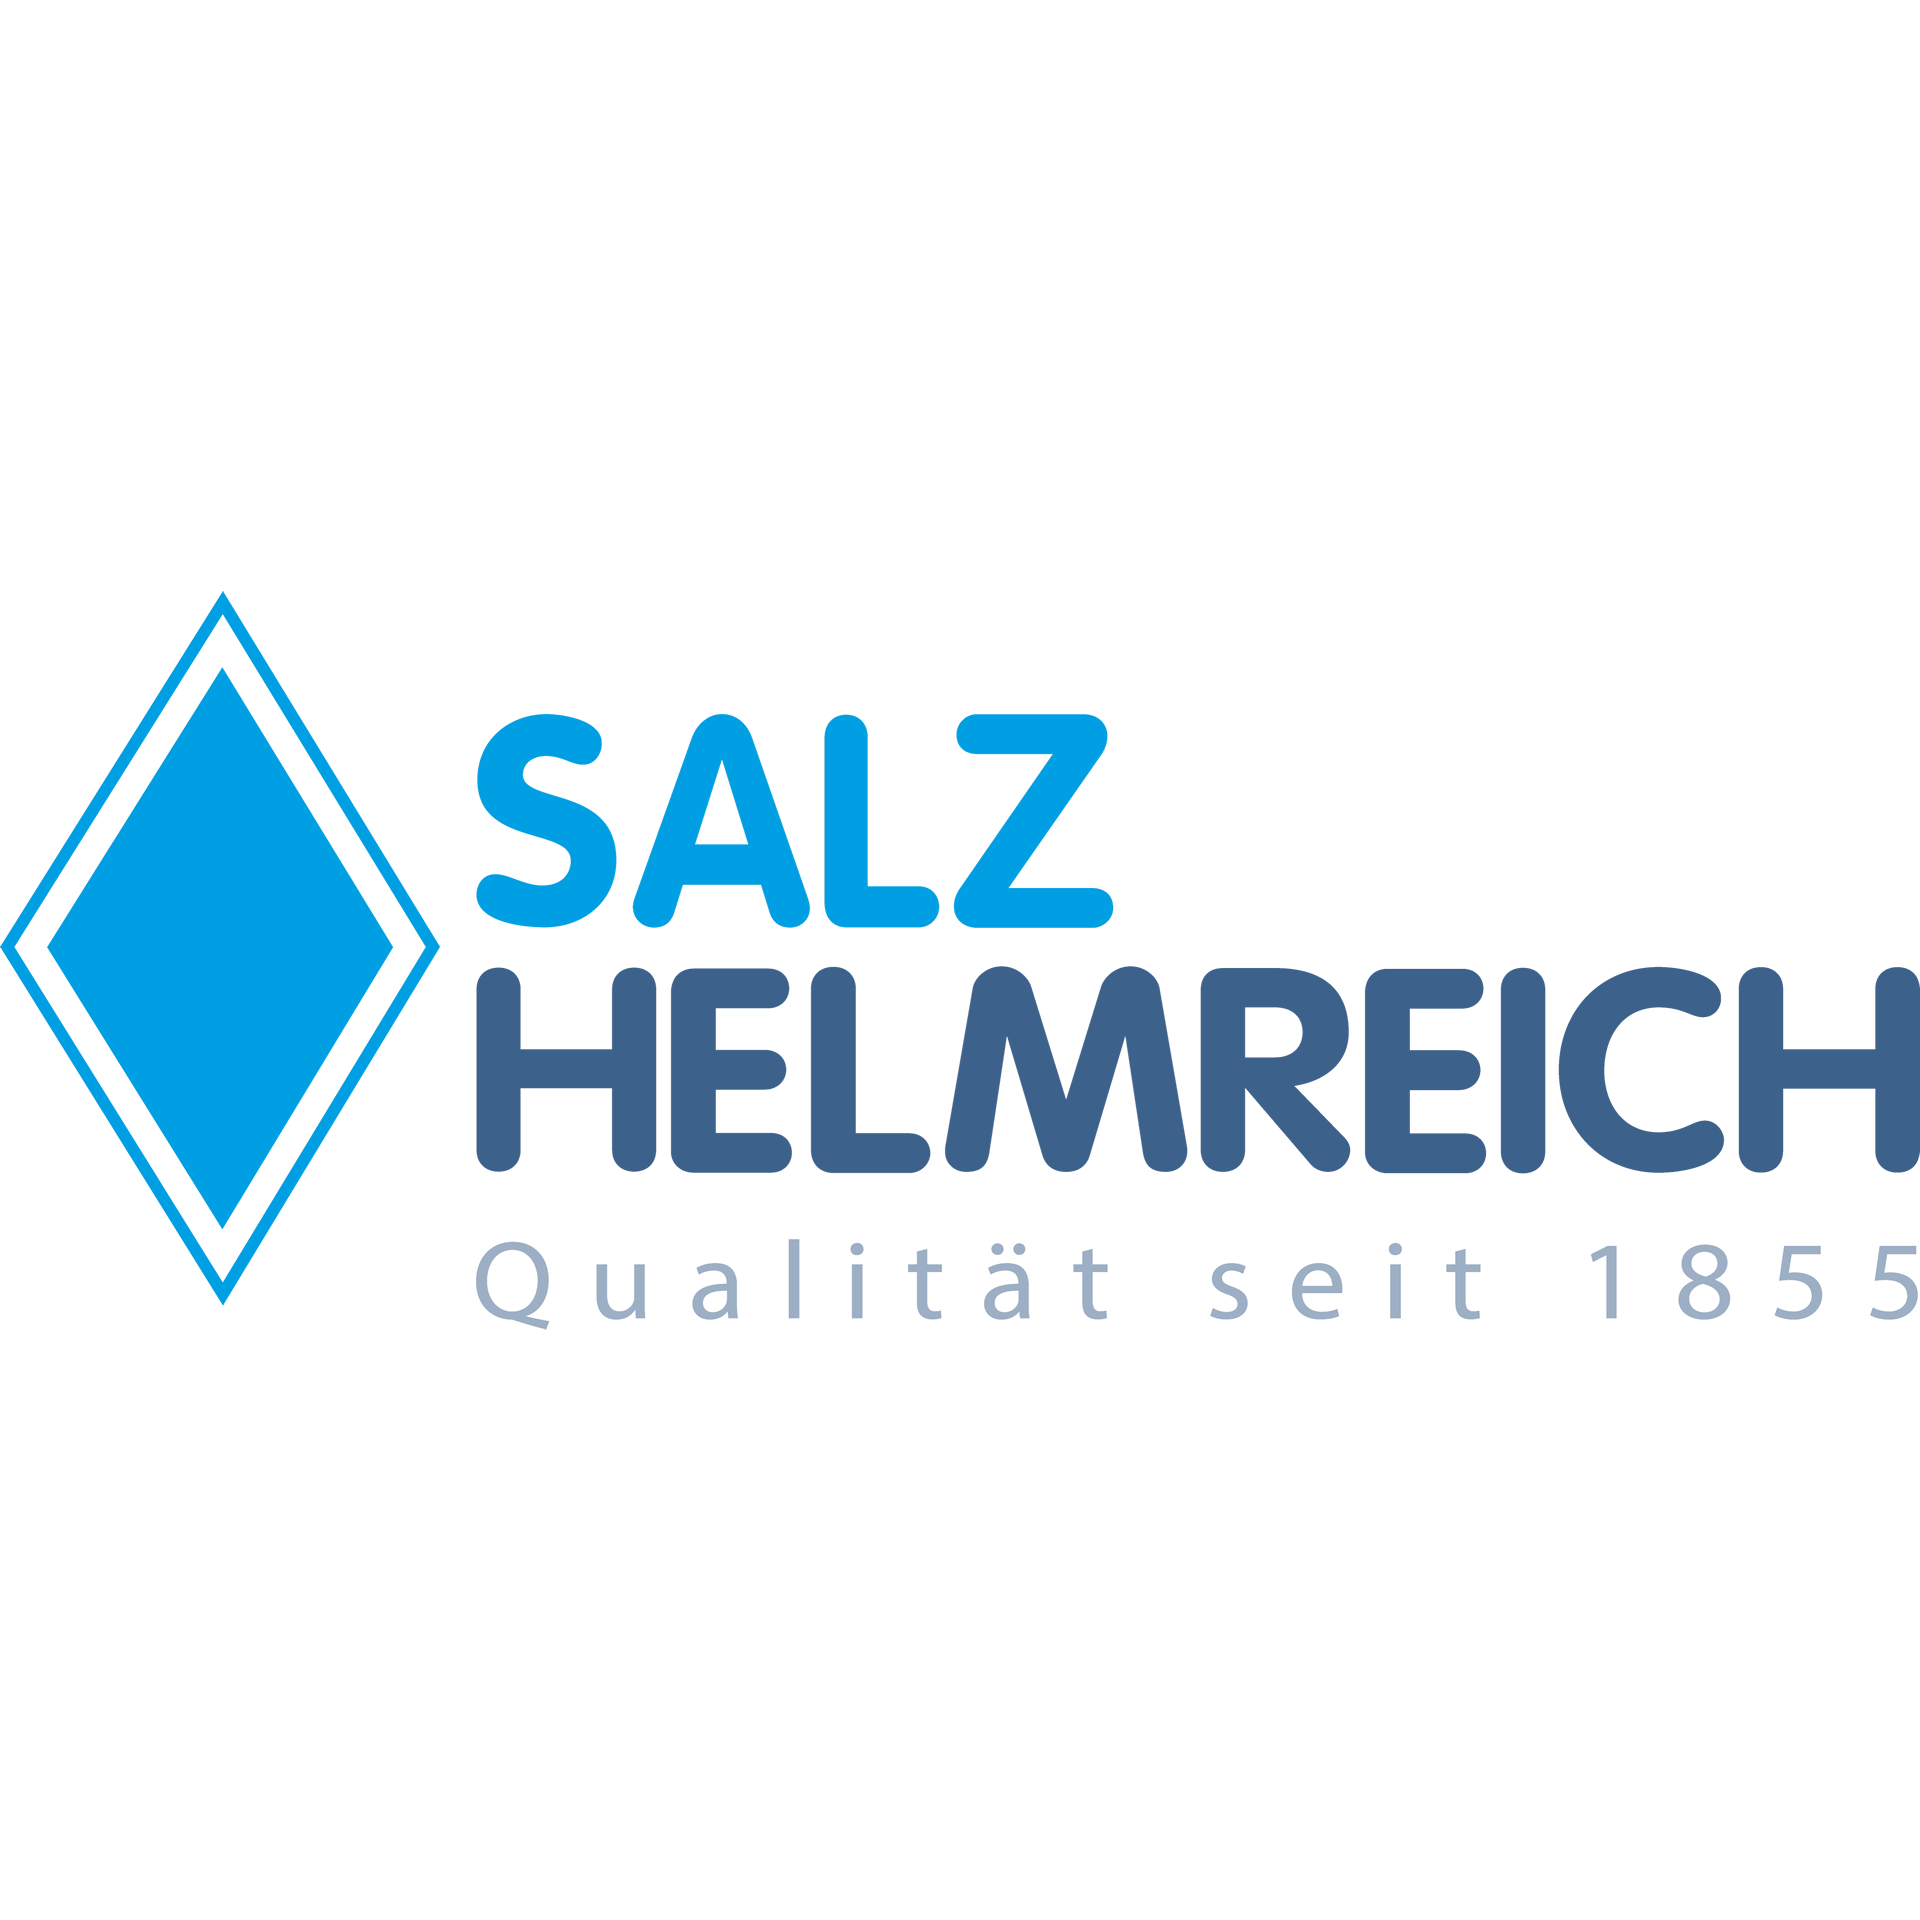 Natriumchlorid Sodiumchlorid Pharma Ph.Eur./USP Excipient Quality Made in Germany im 25kg Sack